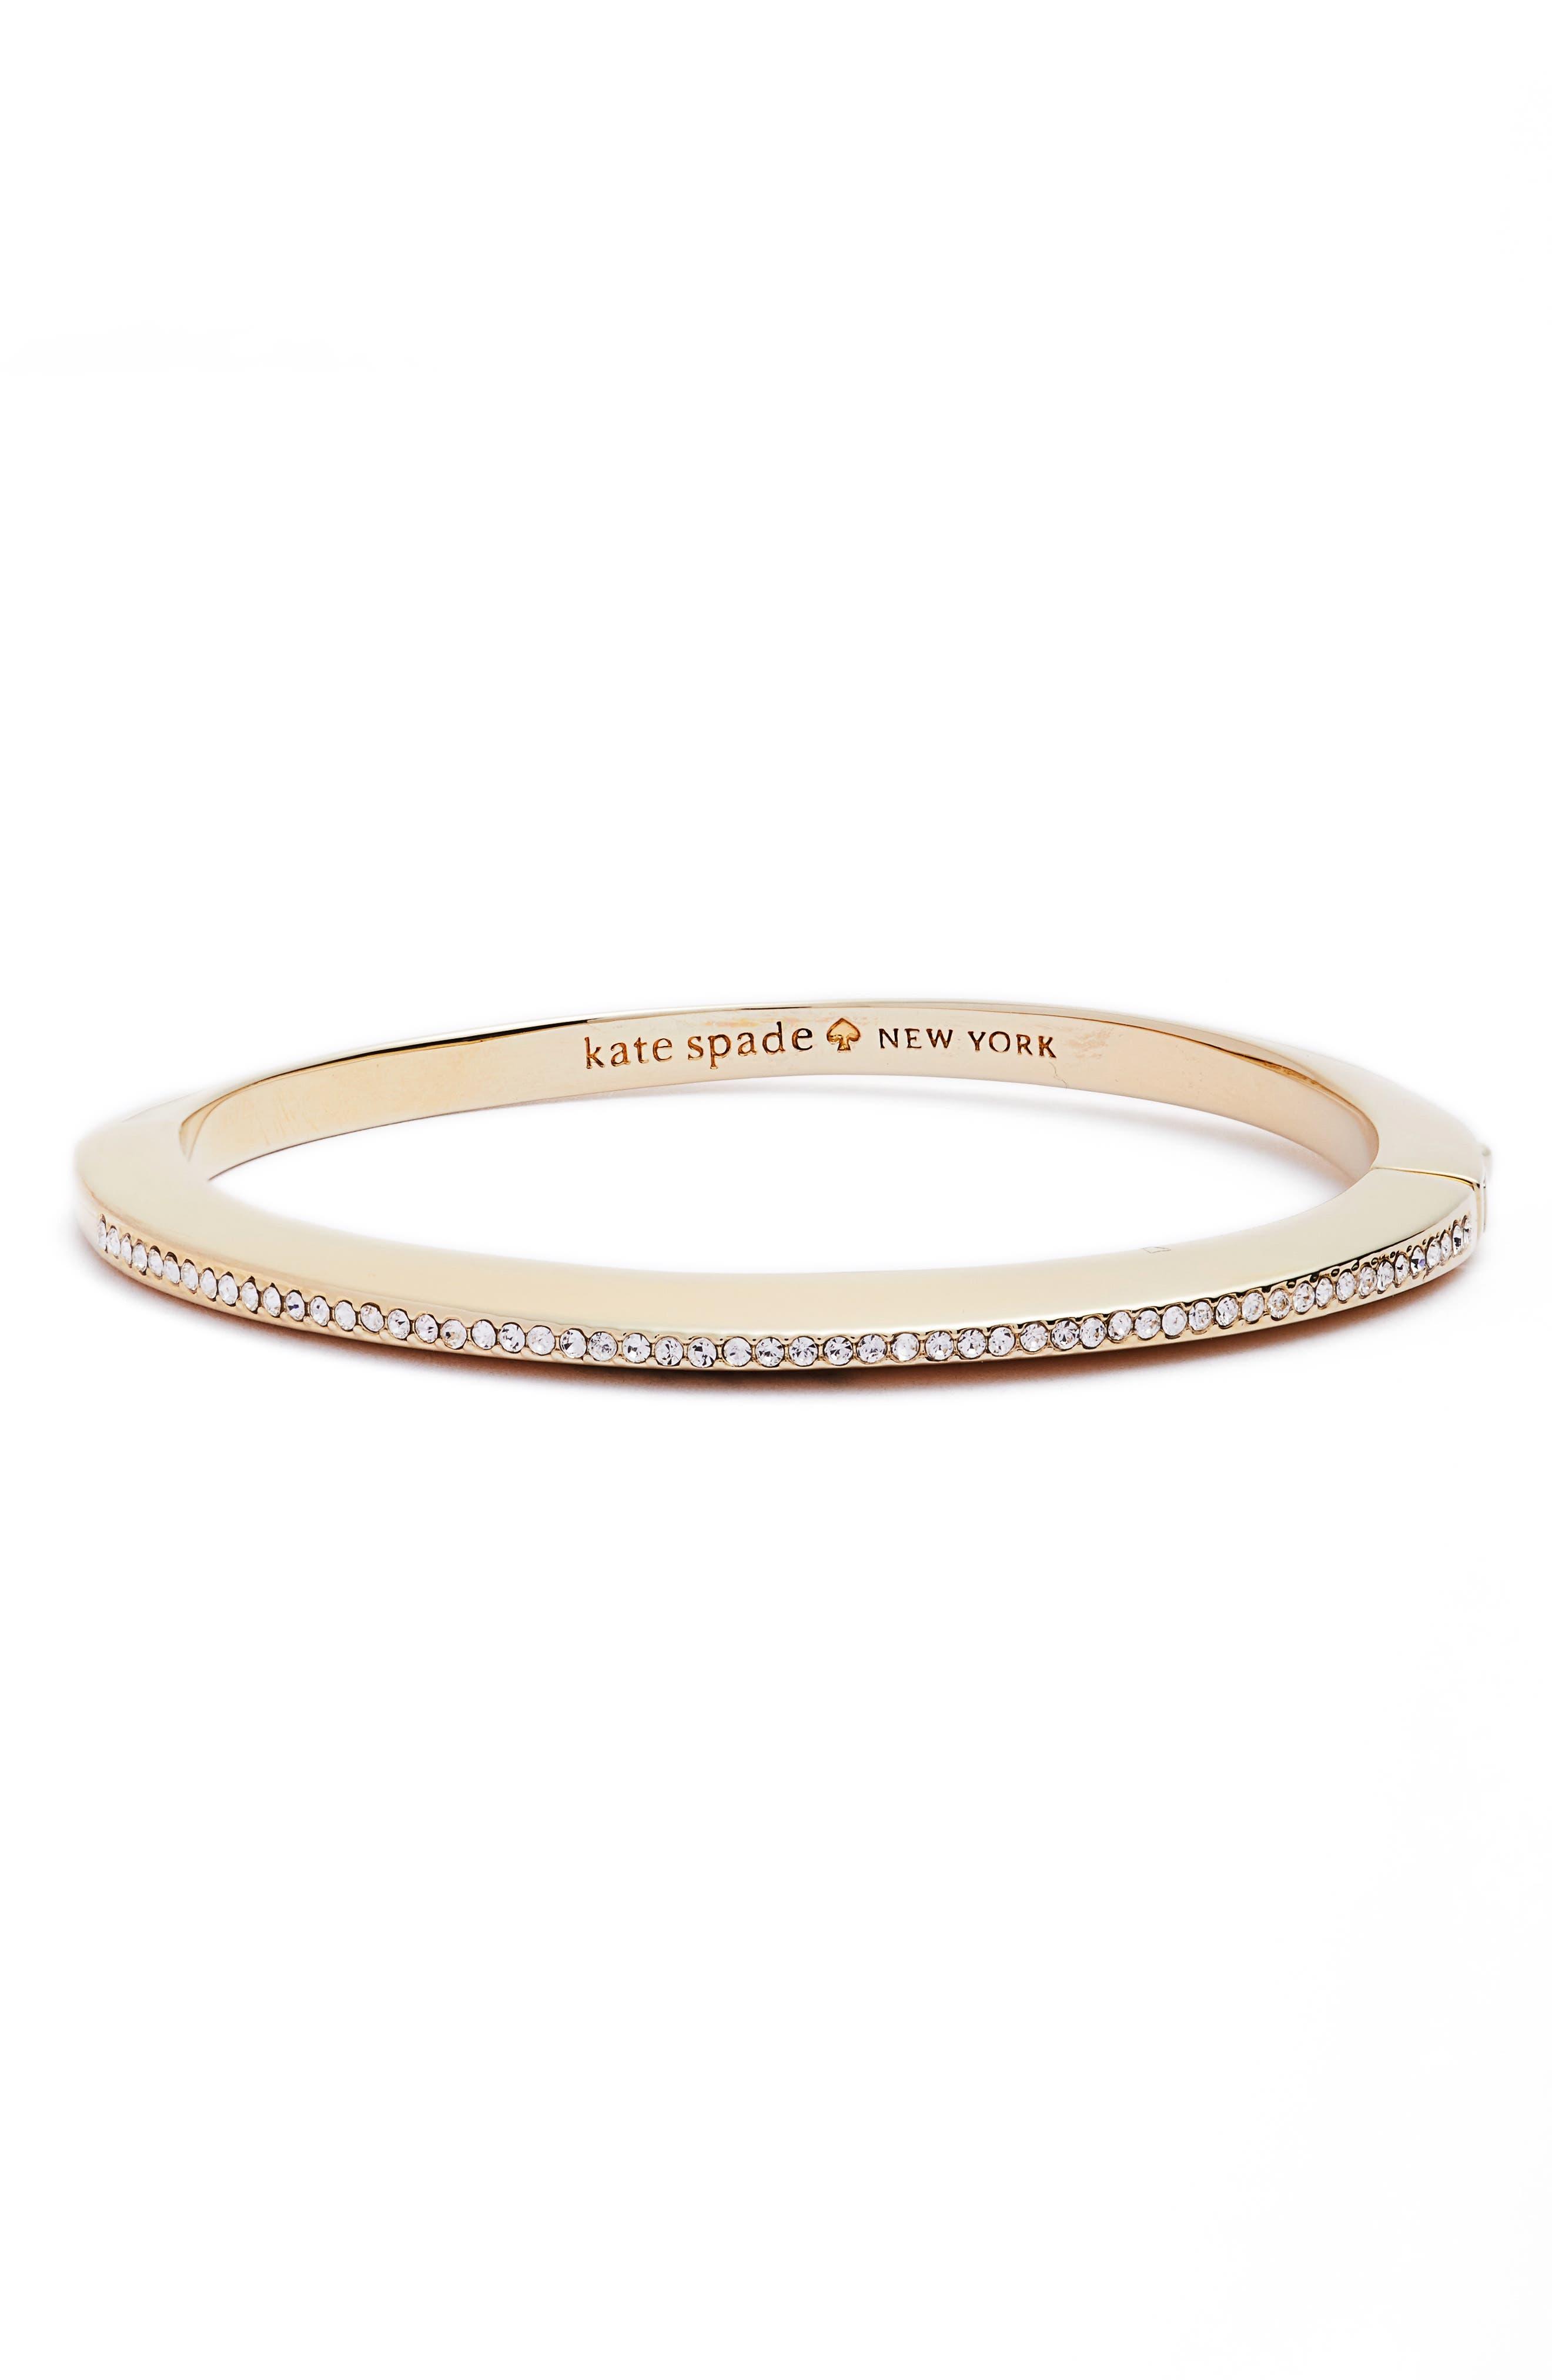 KATE SPADE NEW YORK kate spade sidekicks bangle bracelet